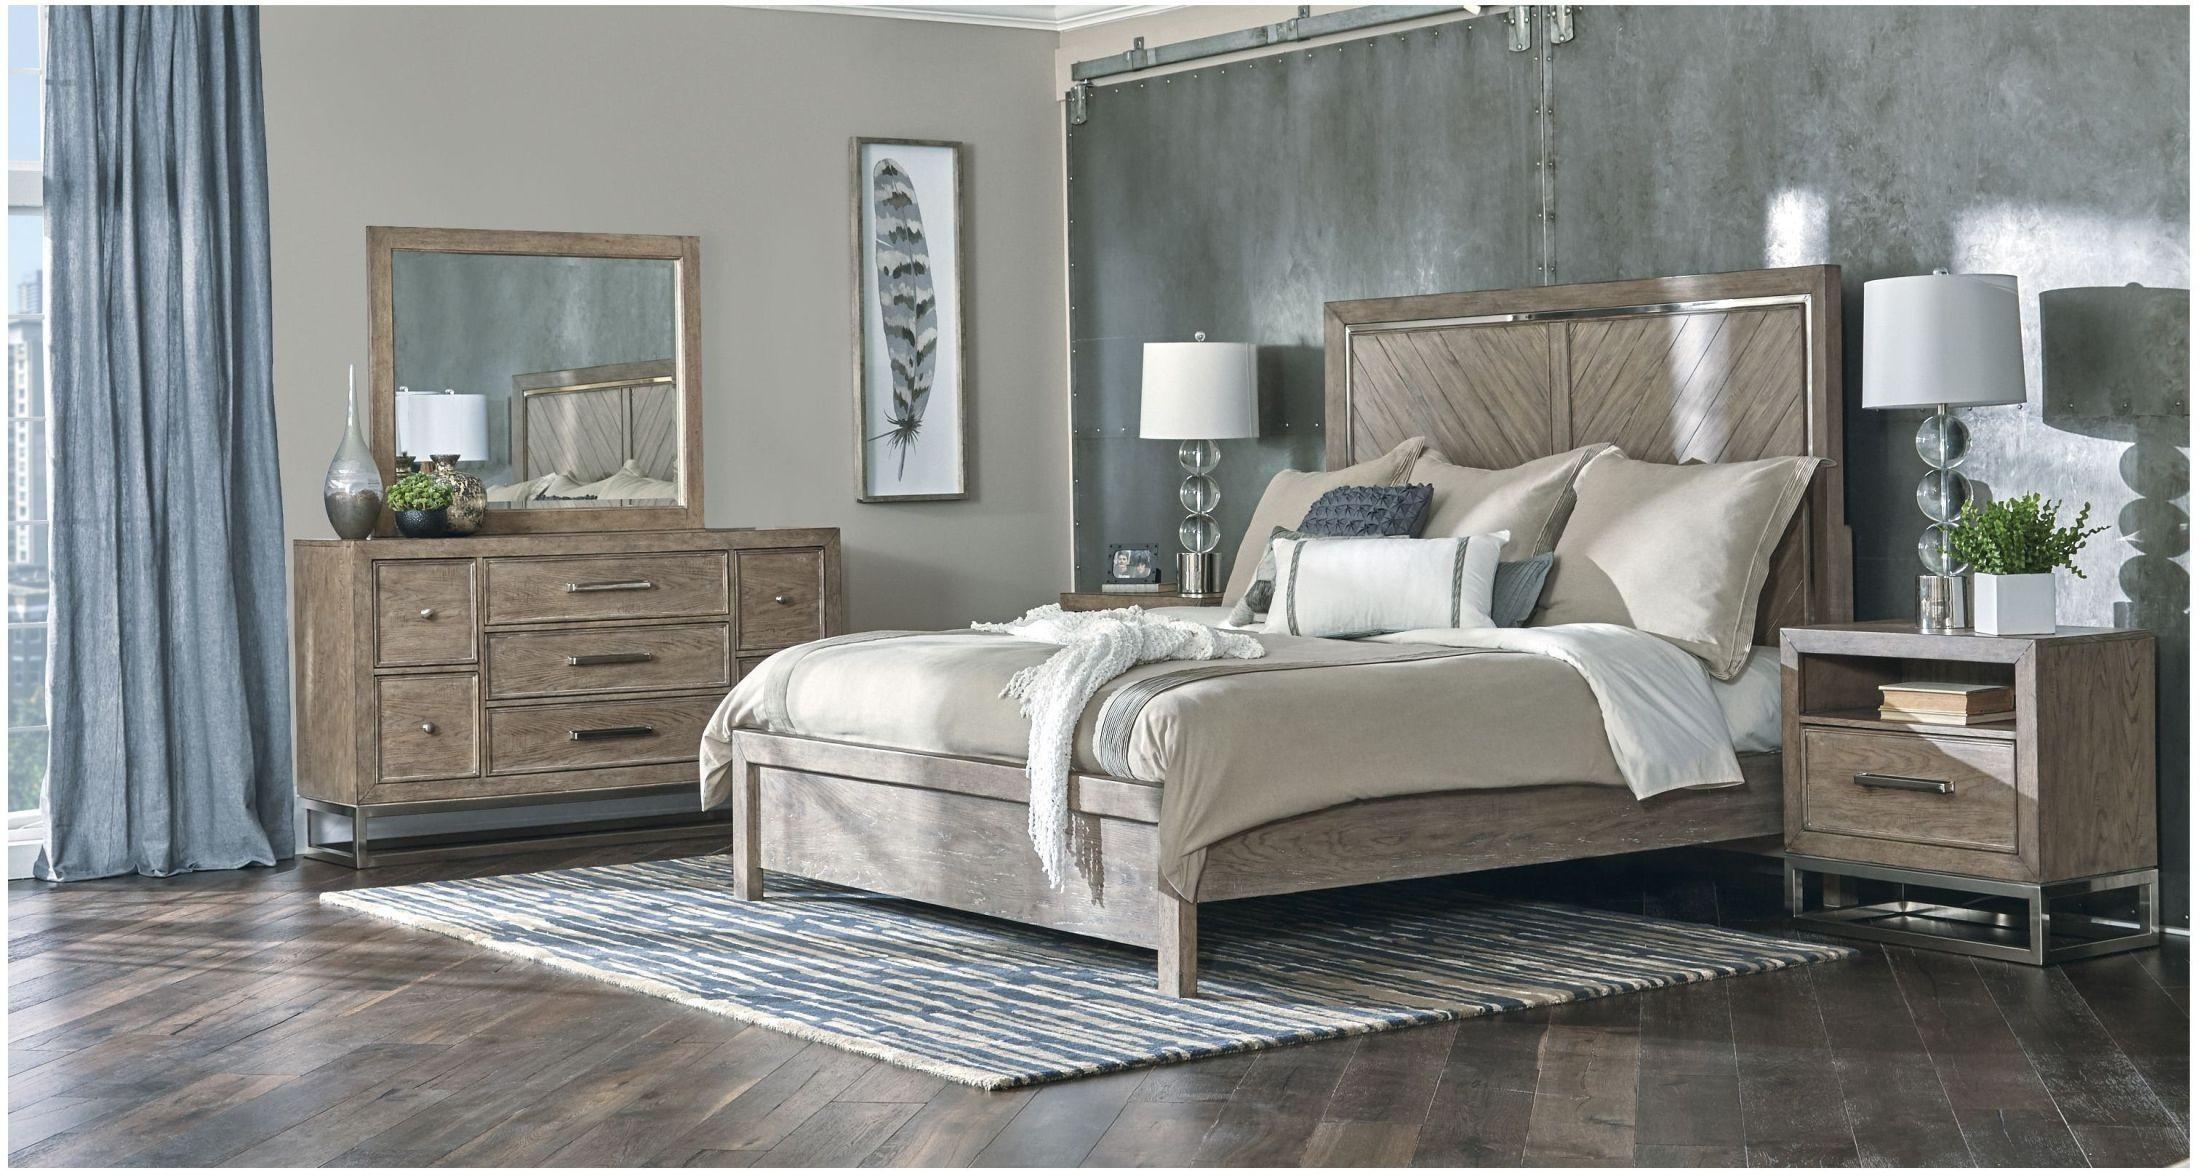 Highland Park Aged Light Brown Panel Bedroom Set from ...